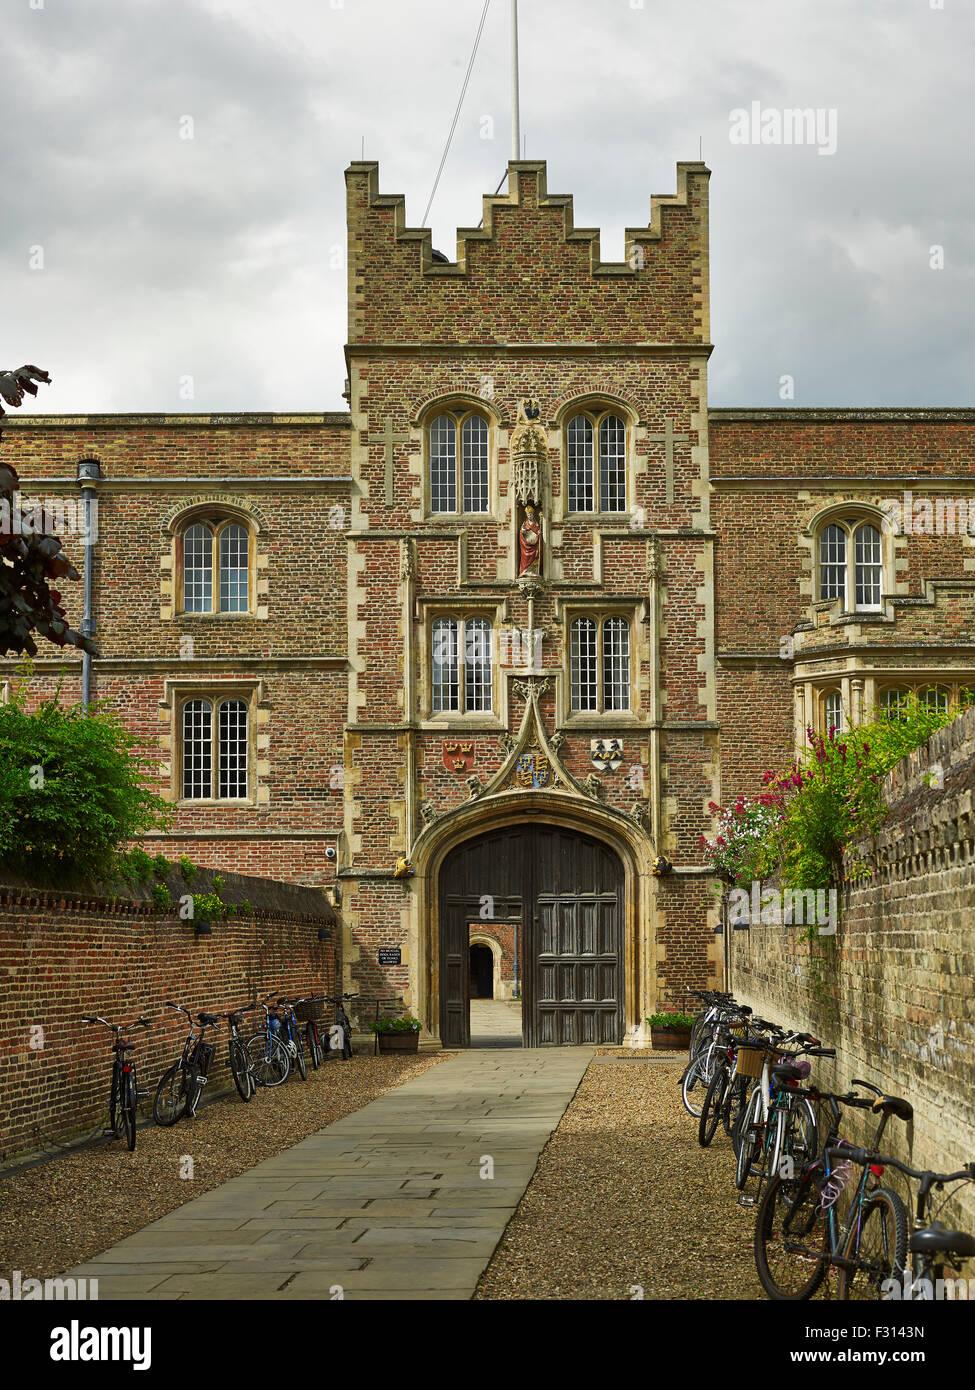 Cambridge University, Jesus College Gatehouse - Stock Image